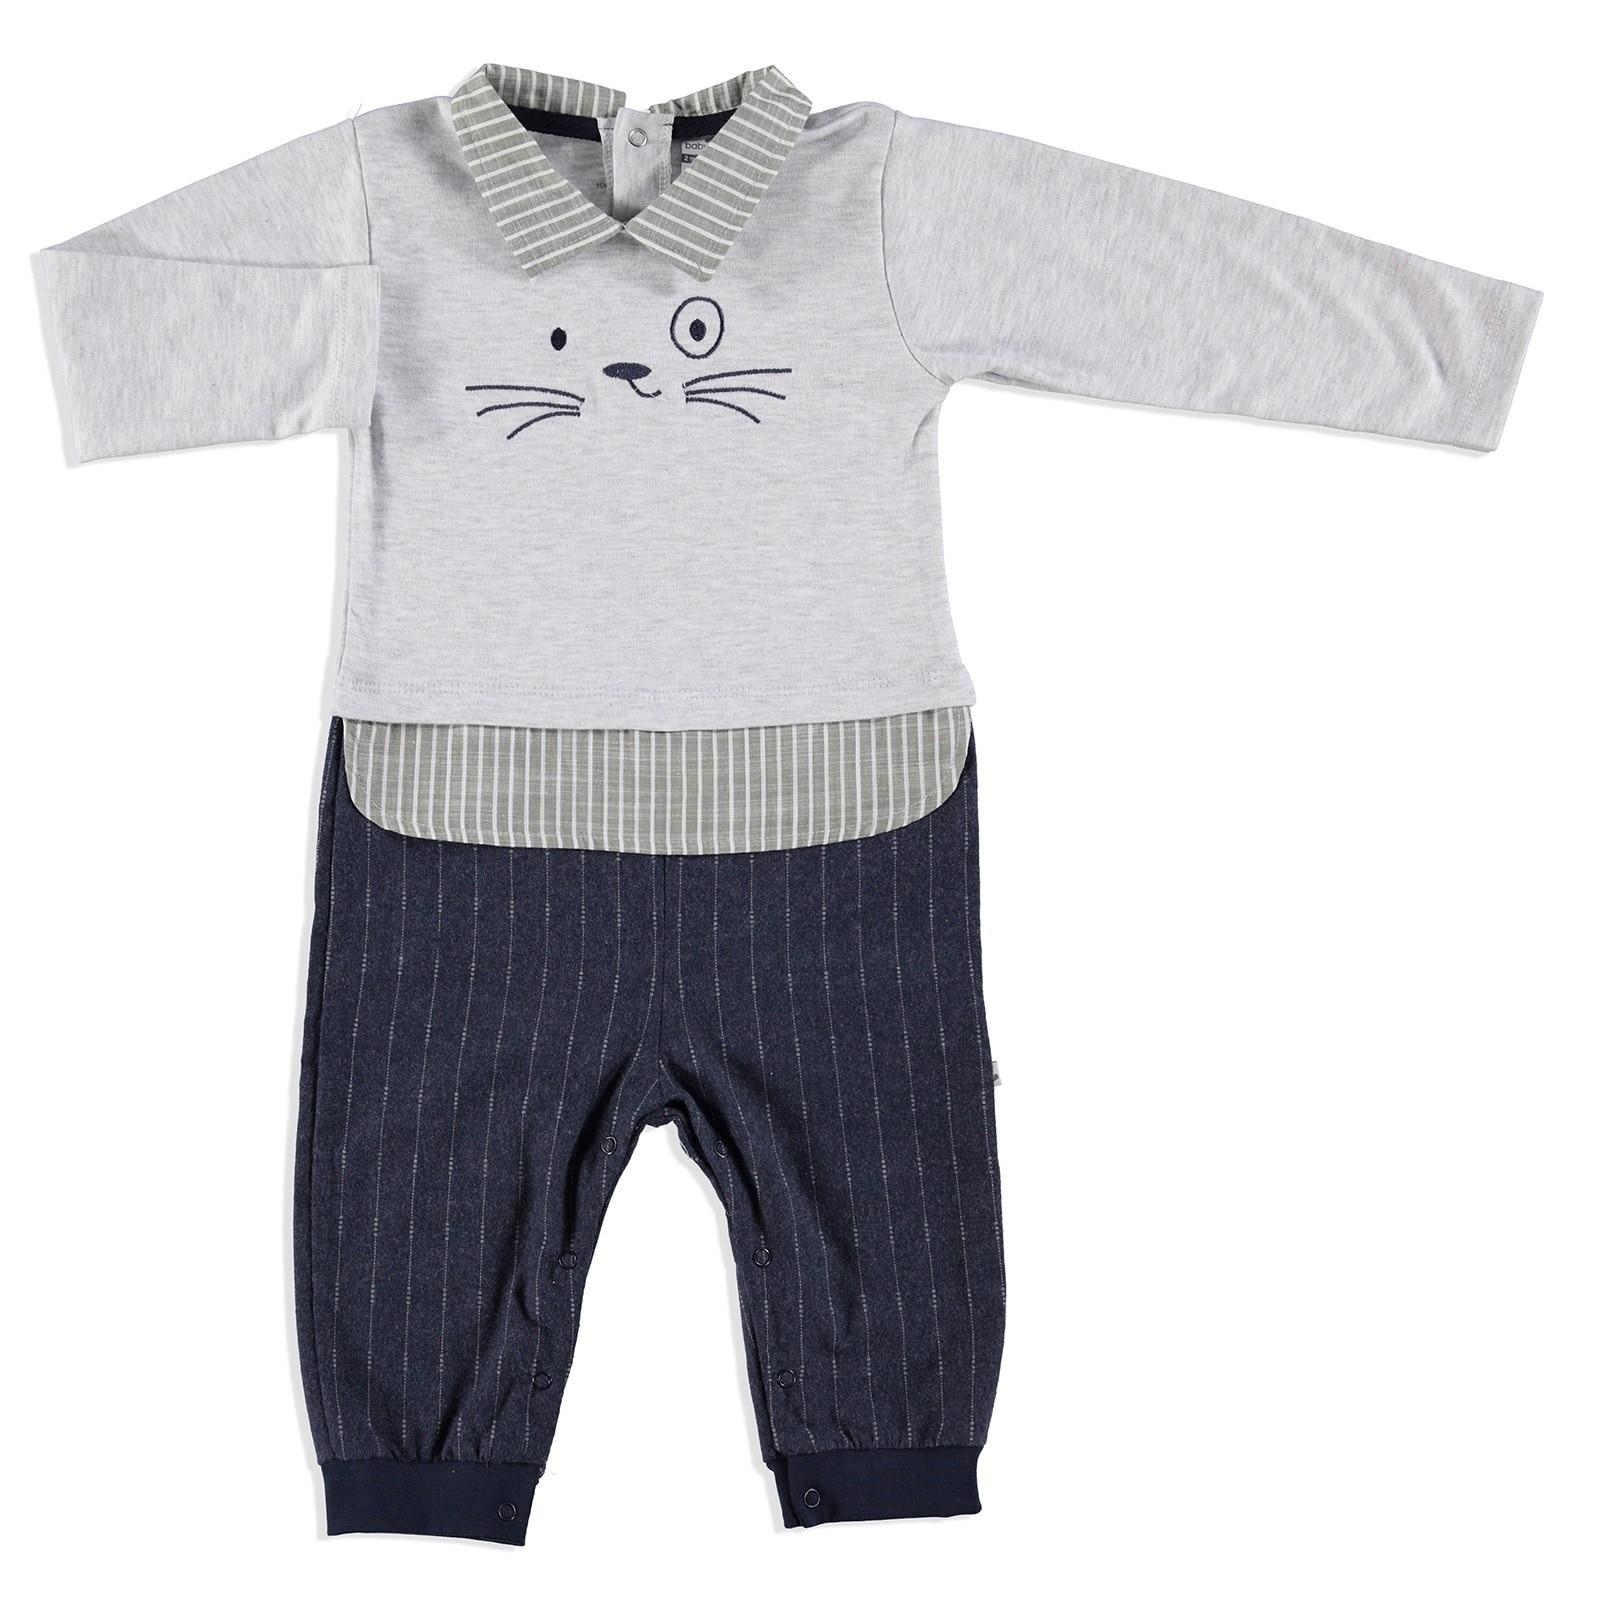 Ebebek BabyZ Baby Shirt Detail Embroidered Footless Romper